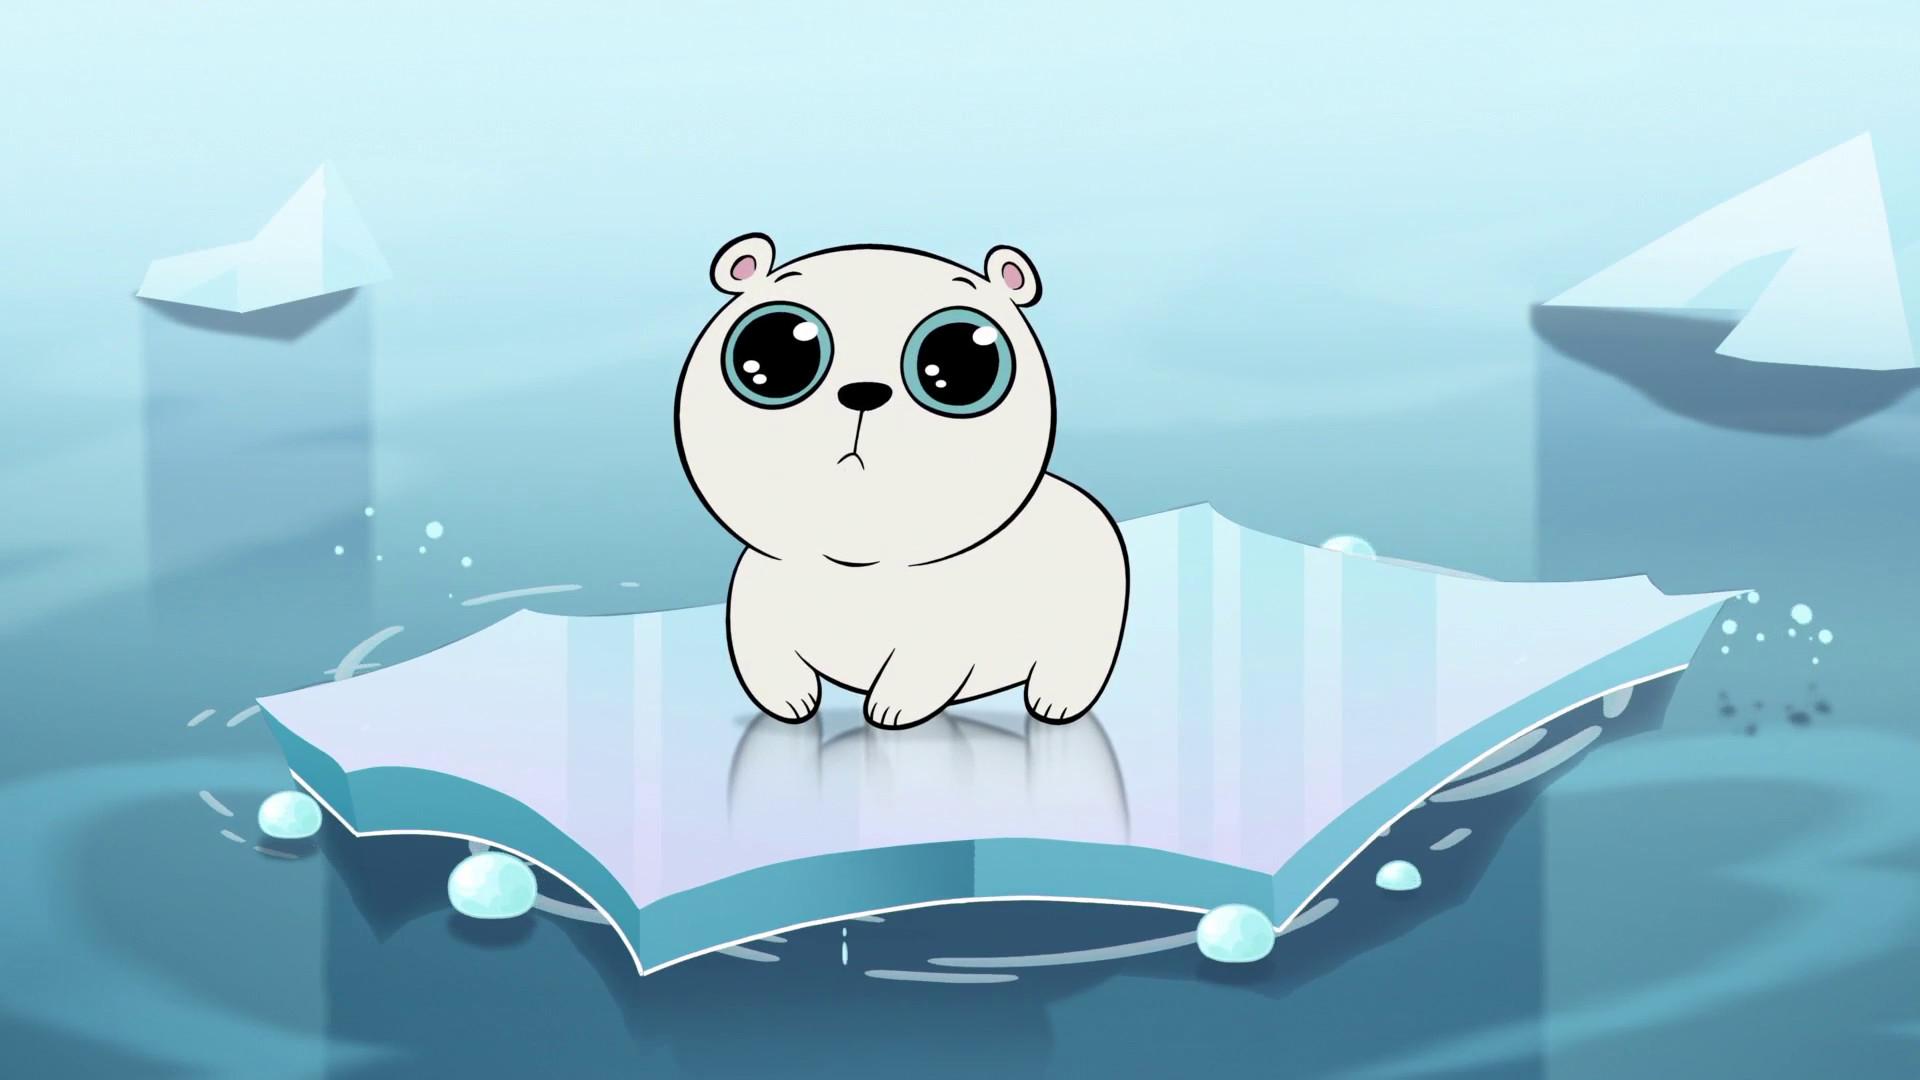 Download - Yuri On Ice Bear , HD Wallpaper & Backgrounds